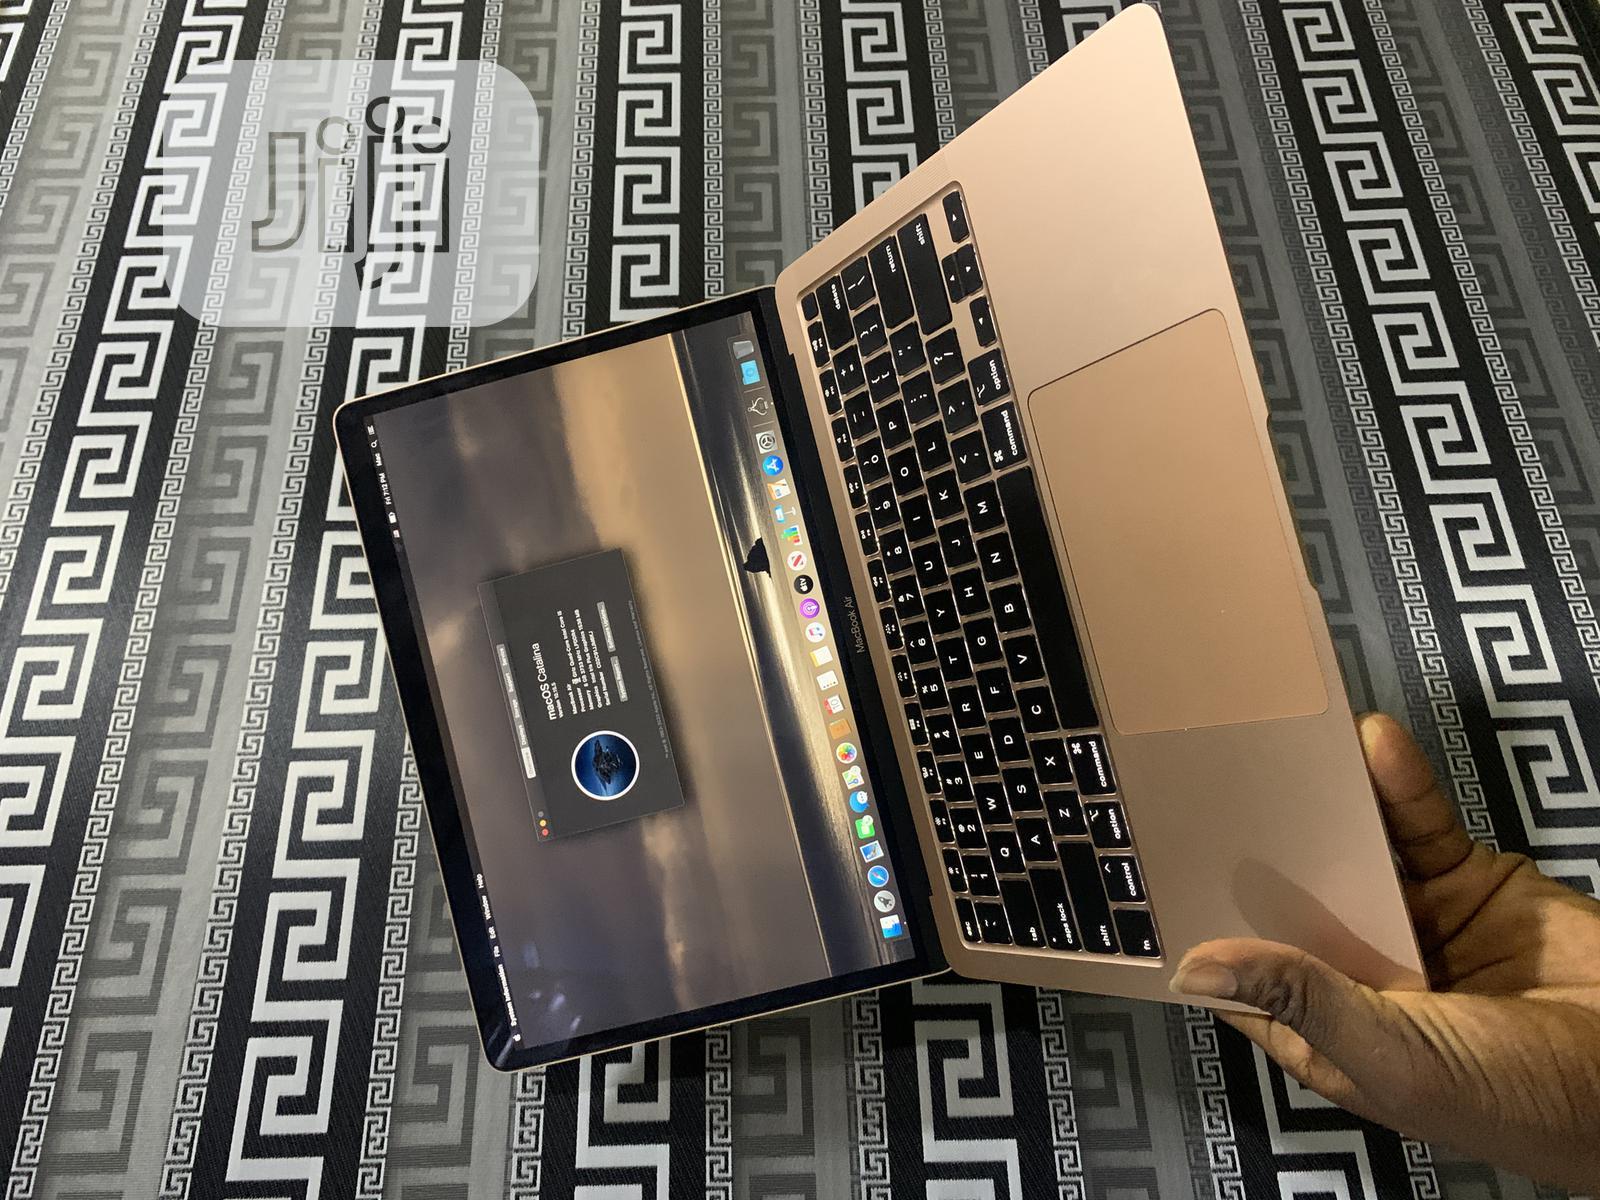 Laptop Apple MacBook Air 8GB Intel Core i5 SSD 512GB   Laptops & Computers for sale in Ikeja, Lagos State, Nigeria